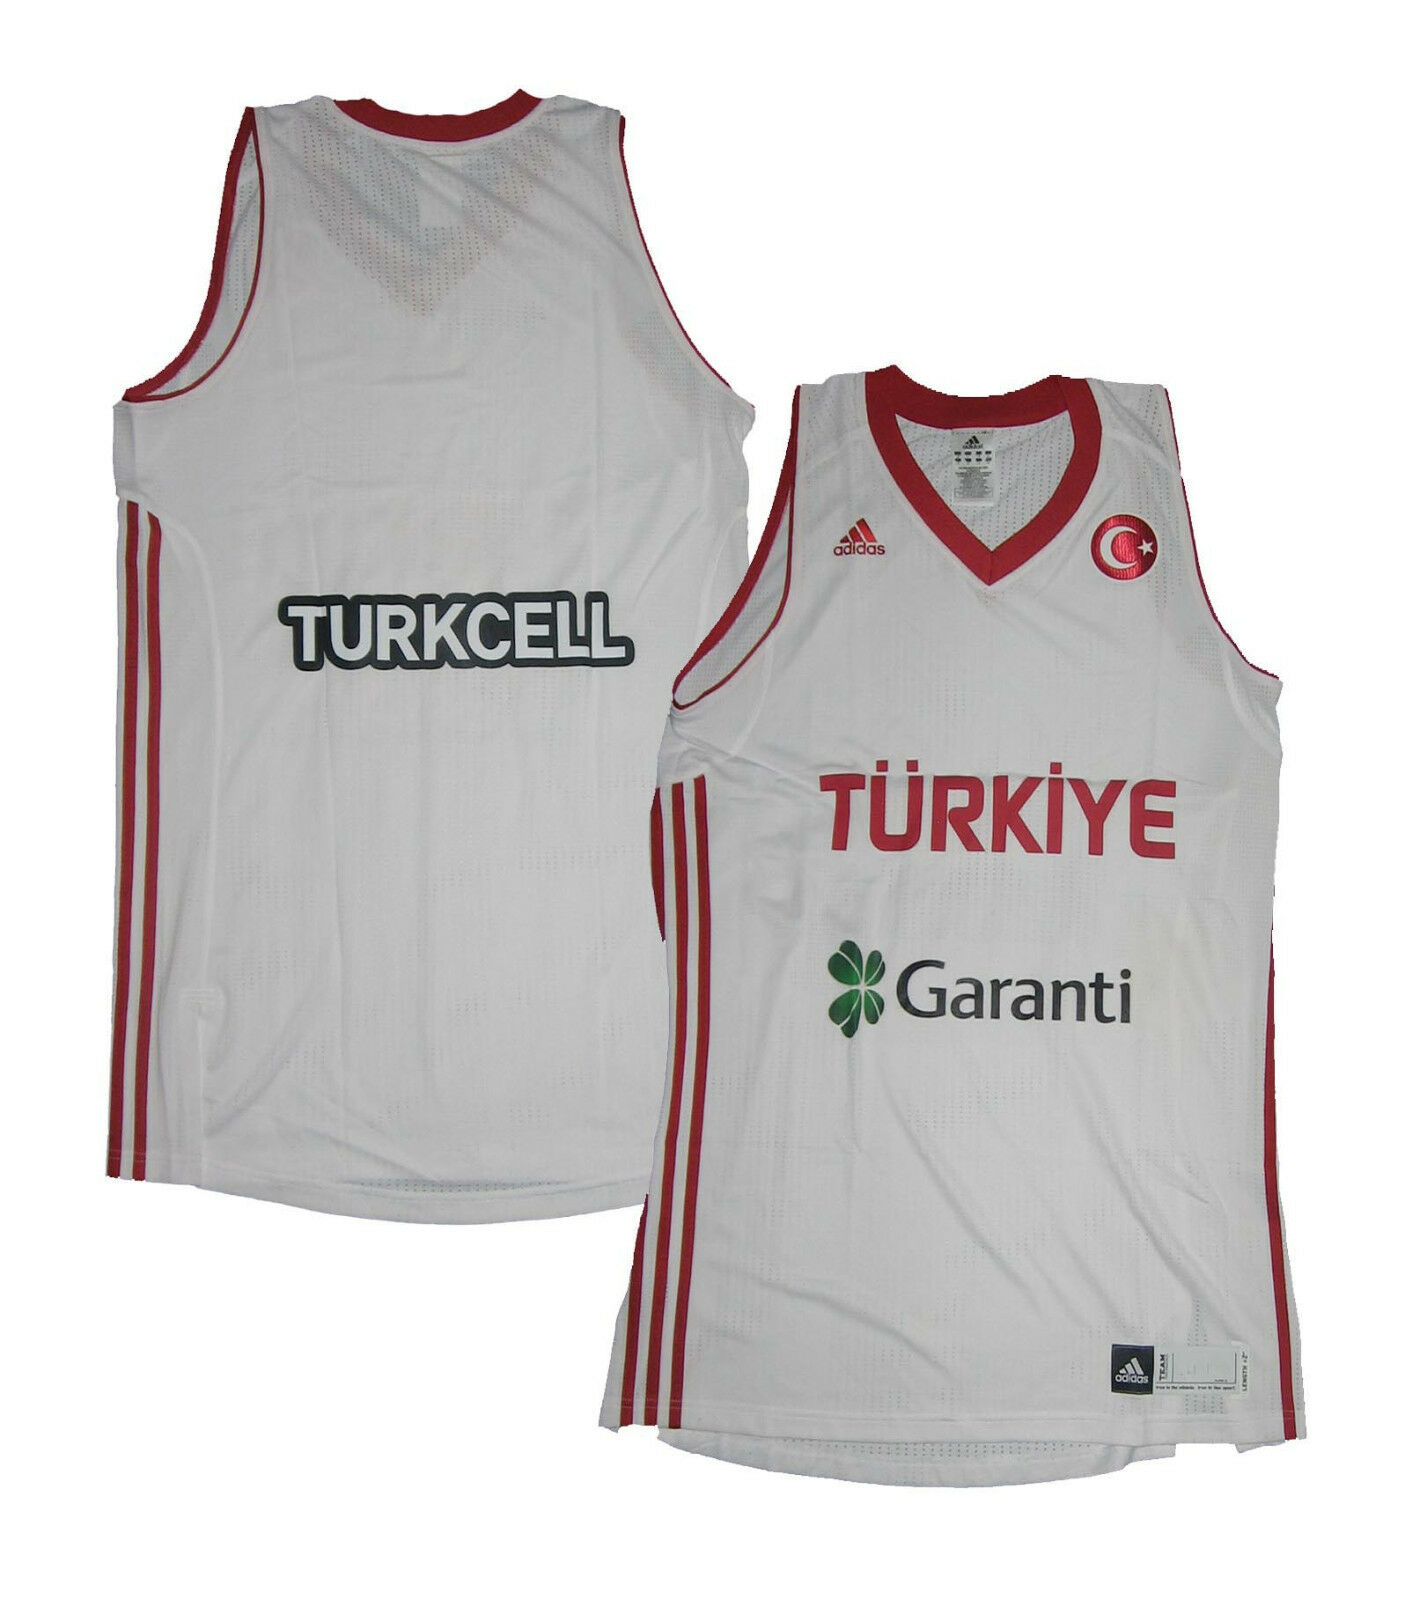 Türkei Basketball Trikot FIBA EM 2011 2011 2011 Adidas 2XL Length+2 b3a560